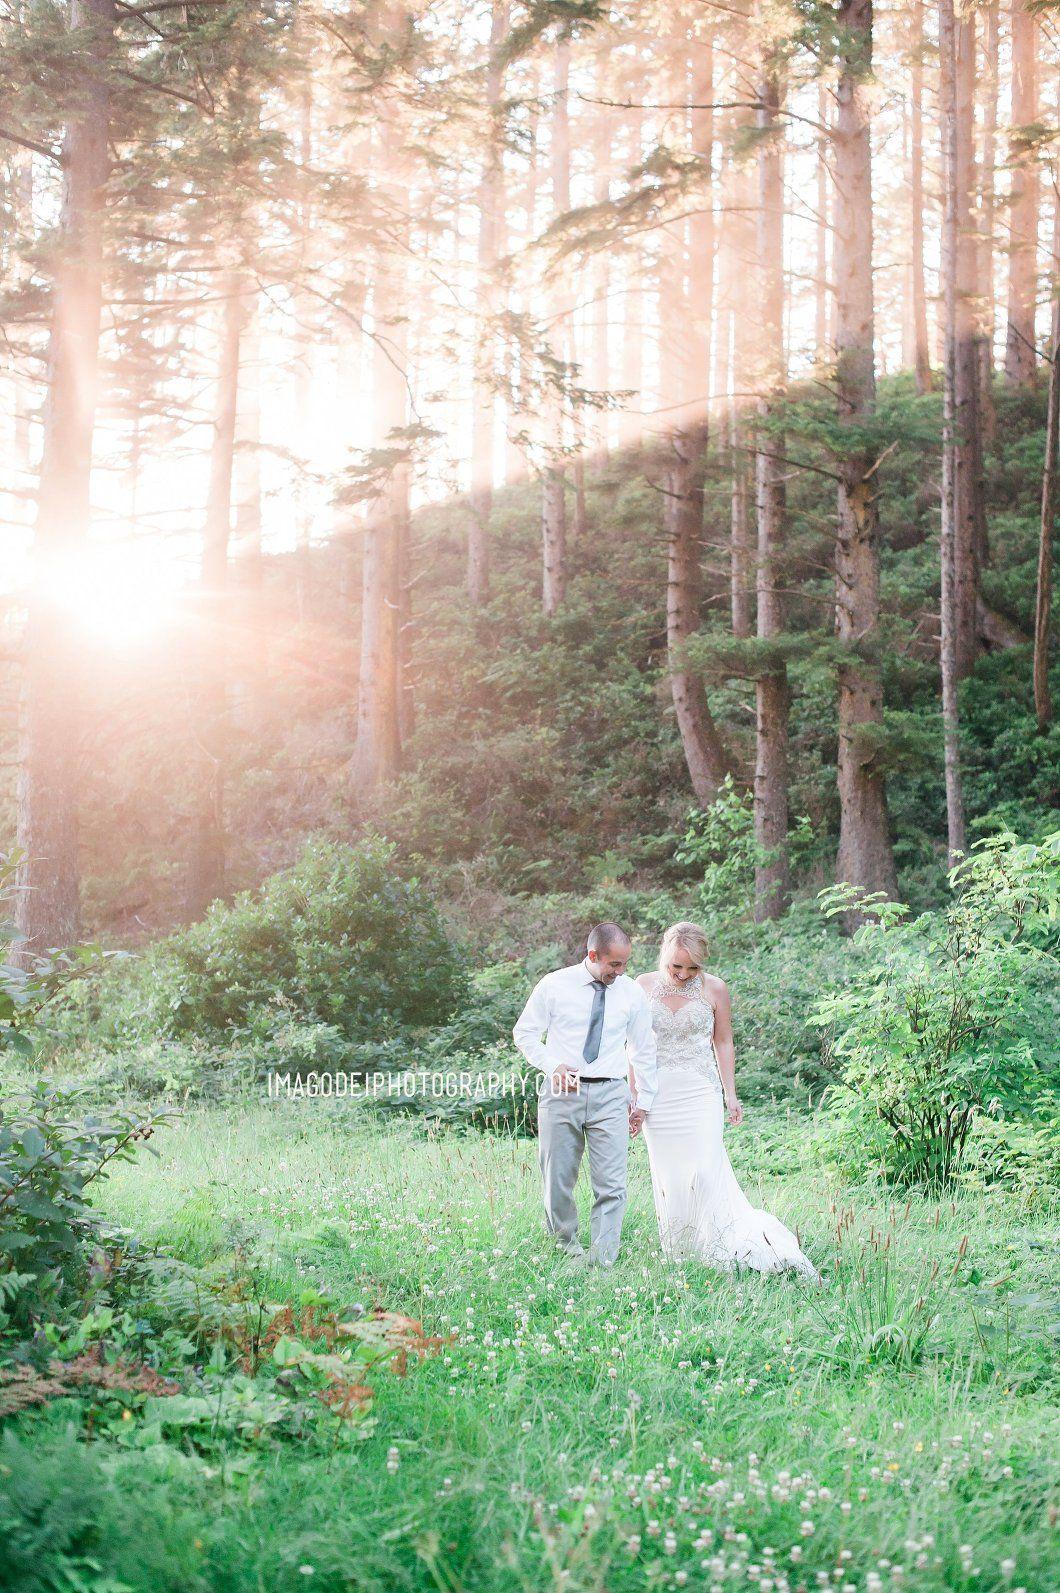 Imago Dei Photography, Cannon Beach, Manzanita Wedding Photographer, Photographer, Oregon Coast Photographers